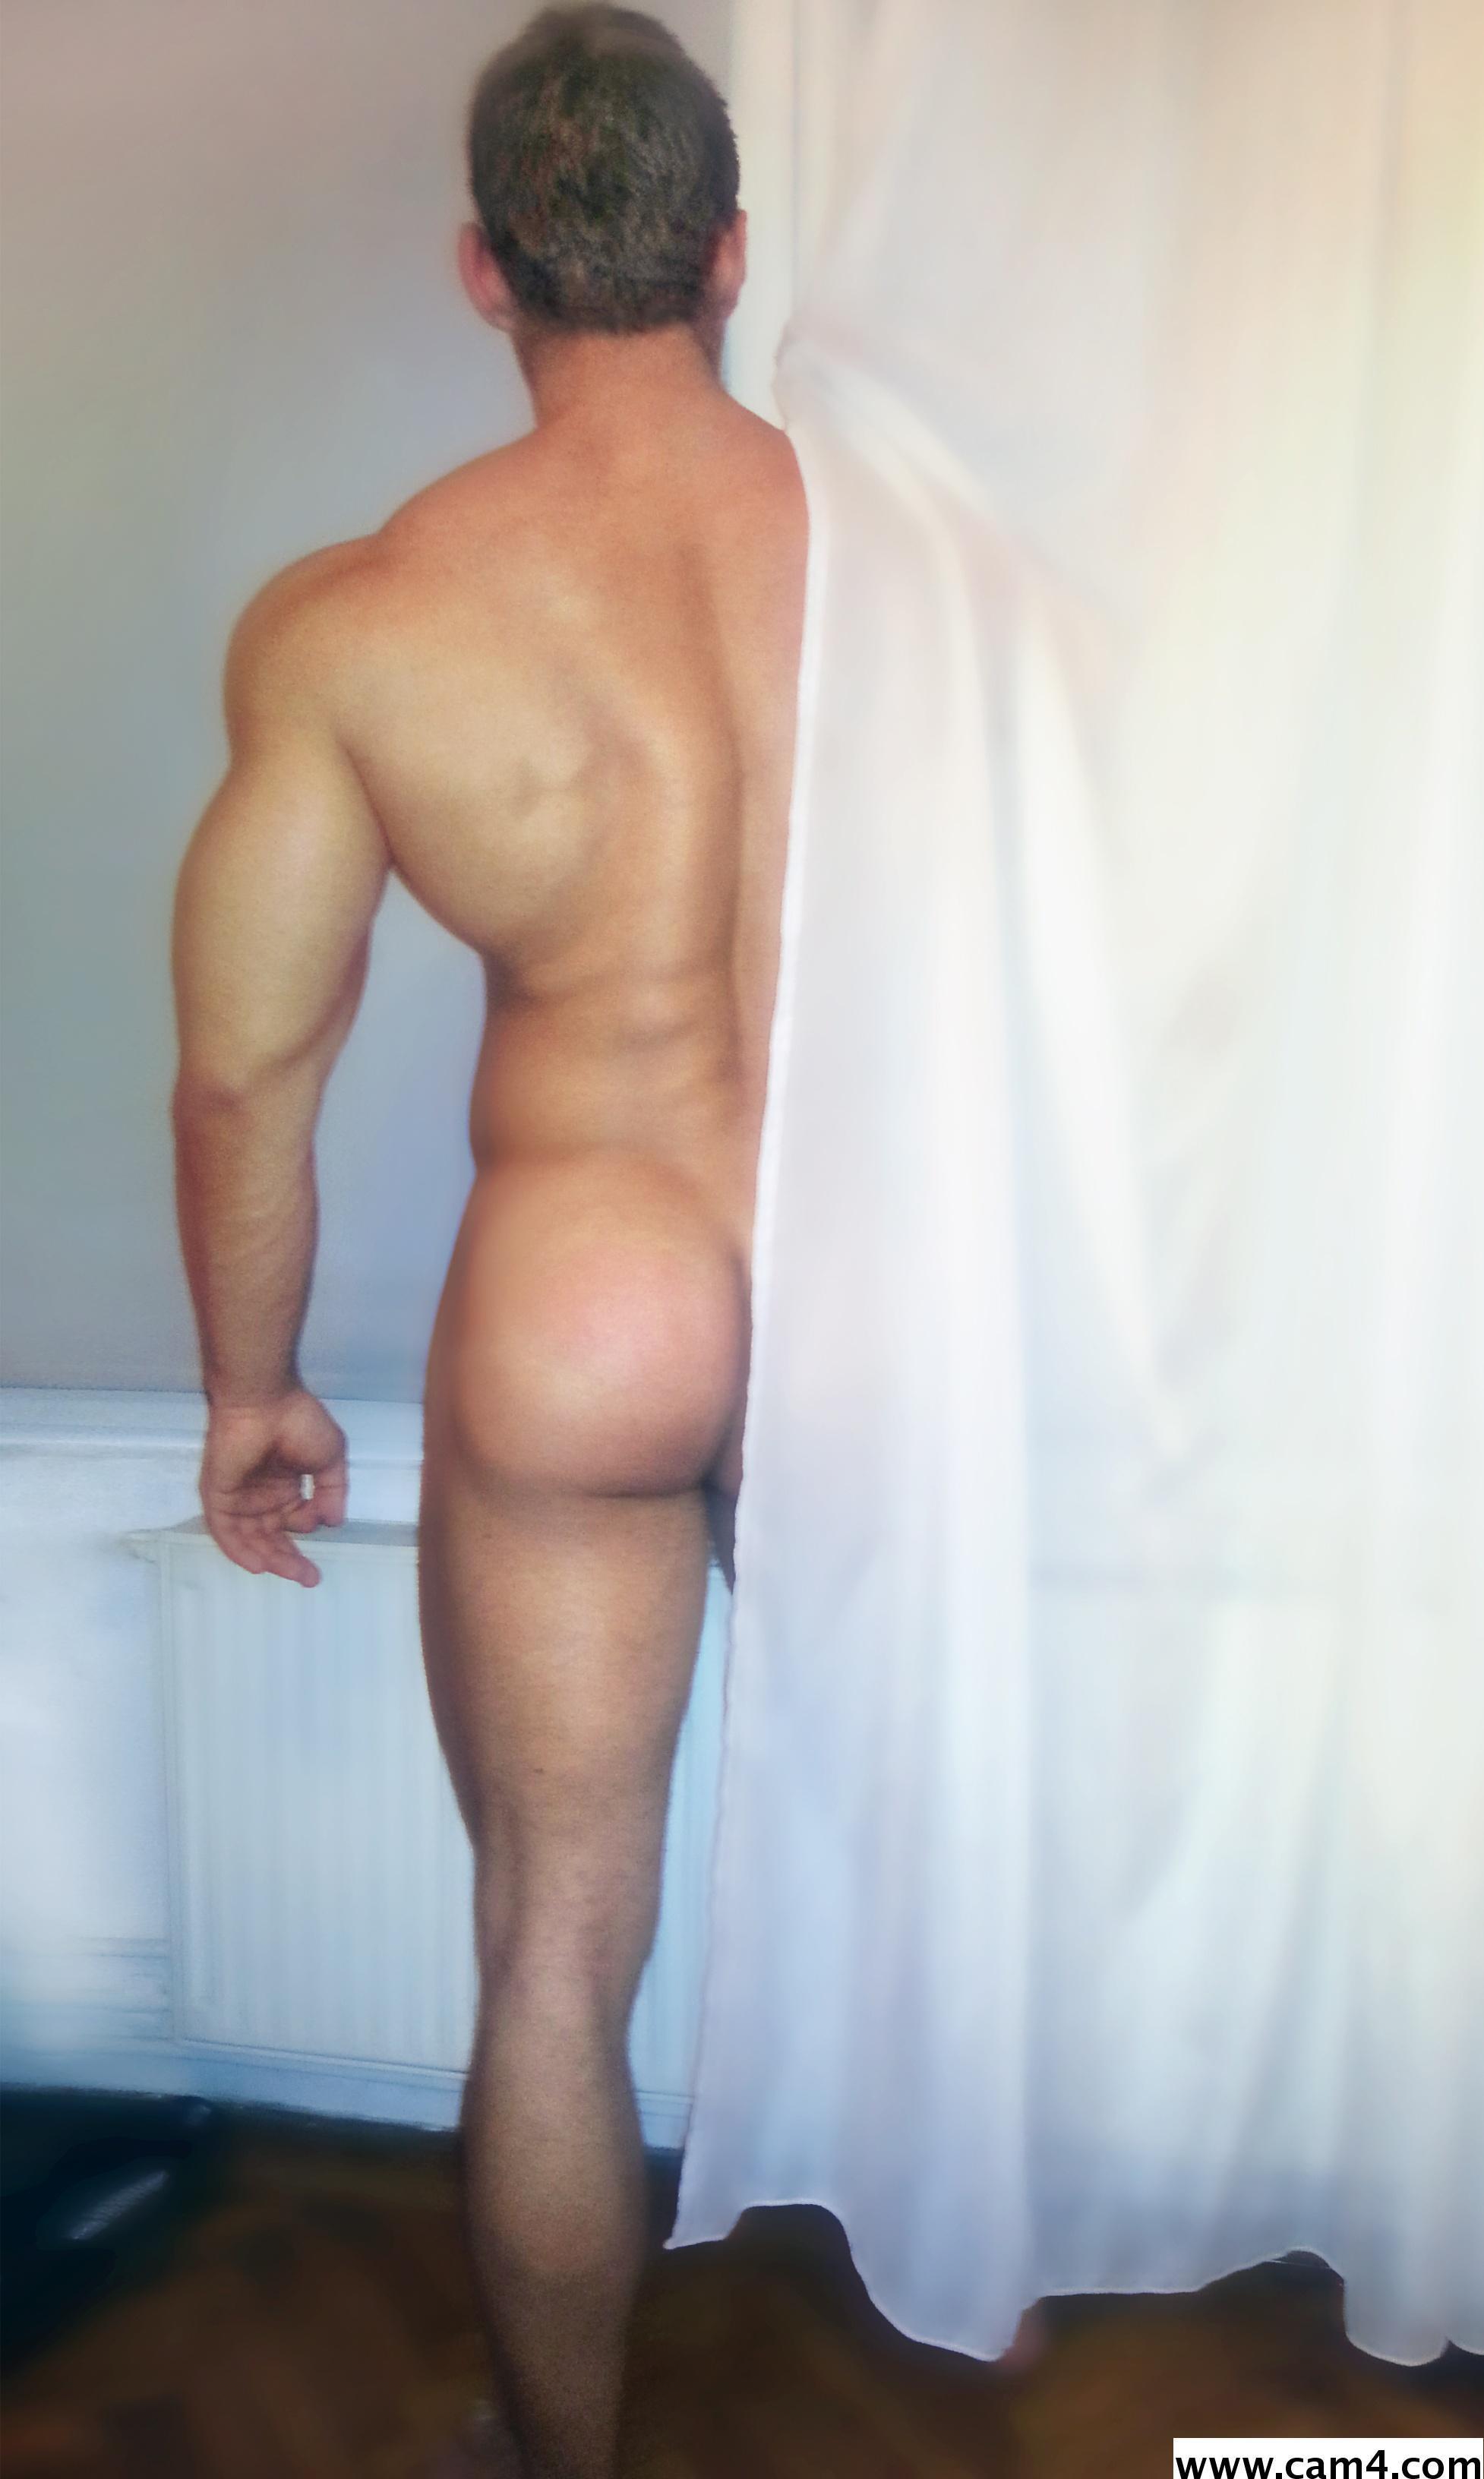 Hottt ass?s=grpyf+jsucyzxjht1twovc3cwutpvzaev60xuonqmqq=